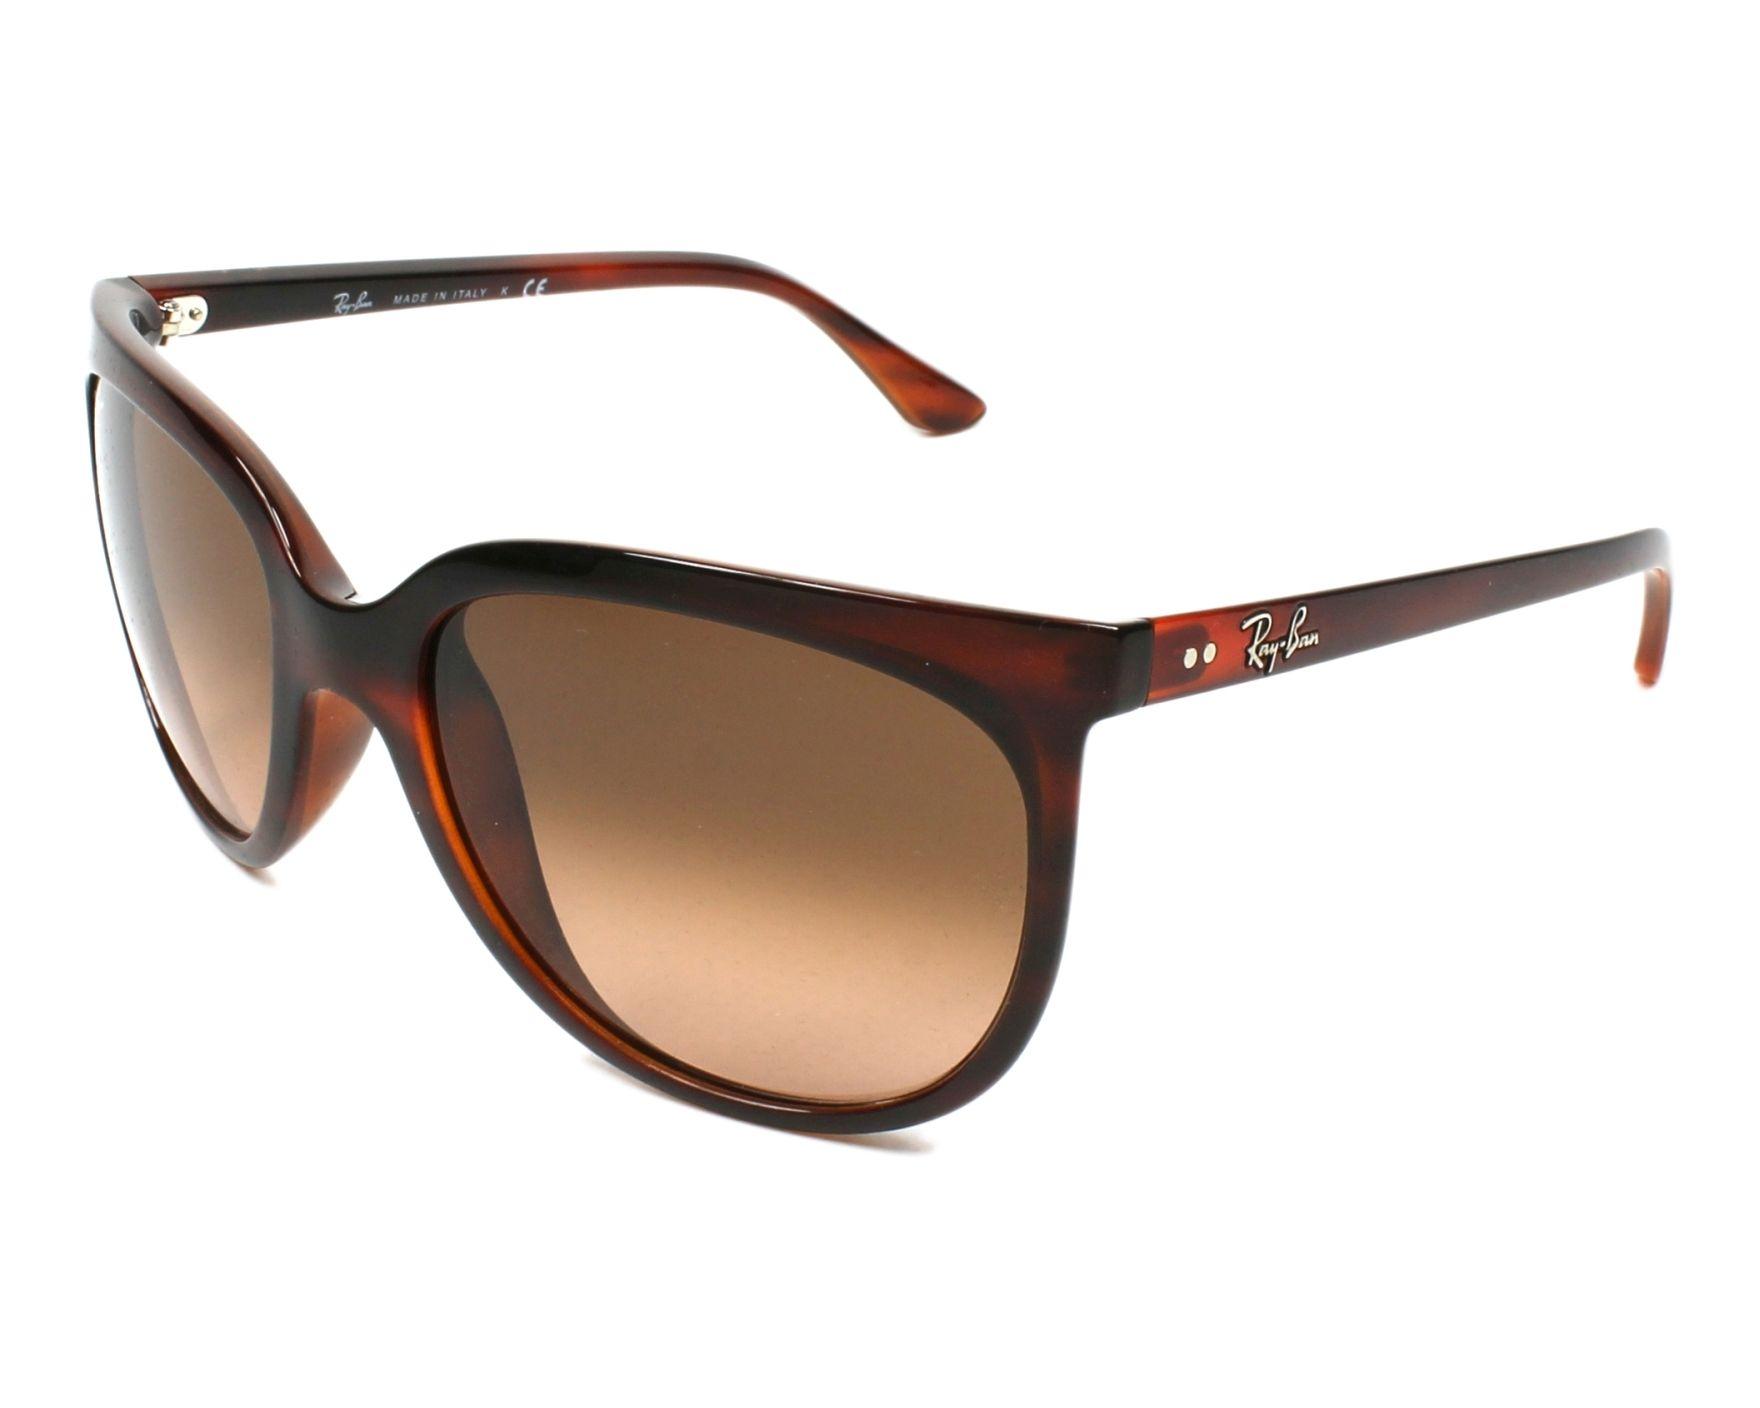 c001443da32 Cheap Ray Ban Rb4126 Cats 1000 Sunglasses D19 « Heritage Malta